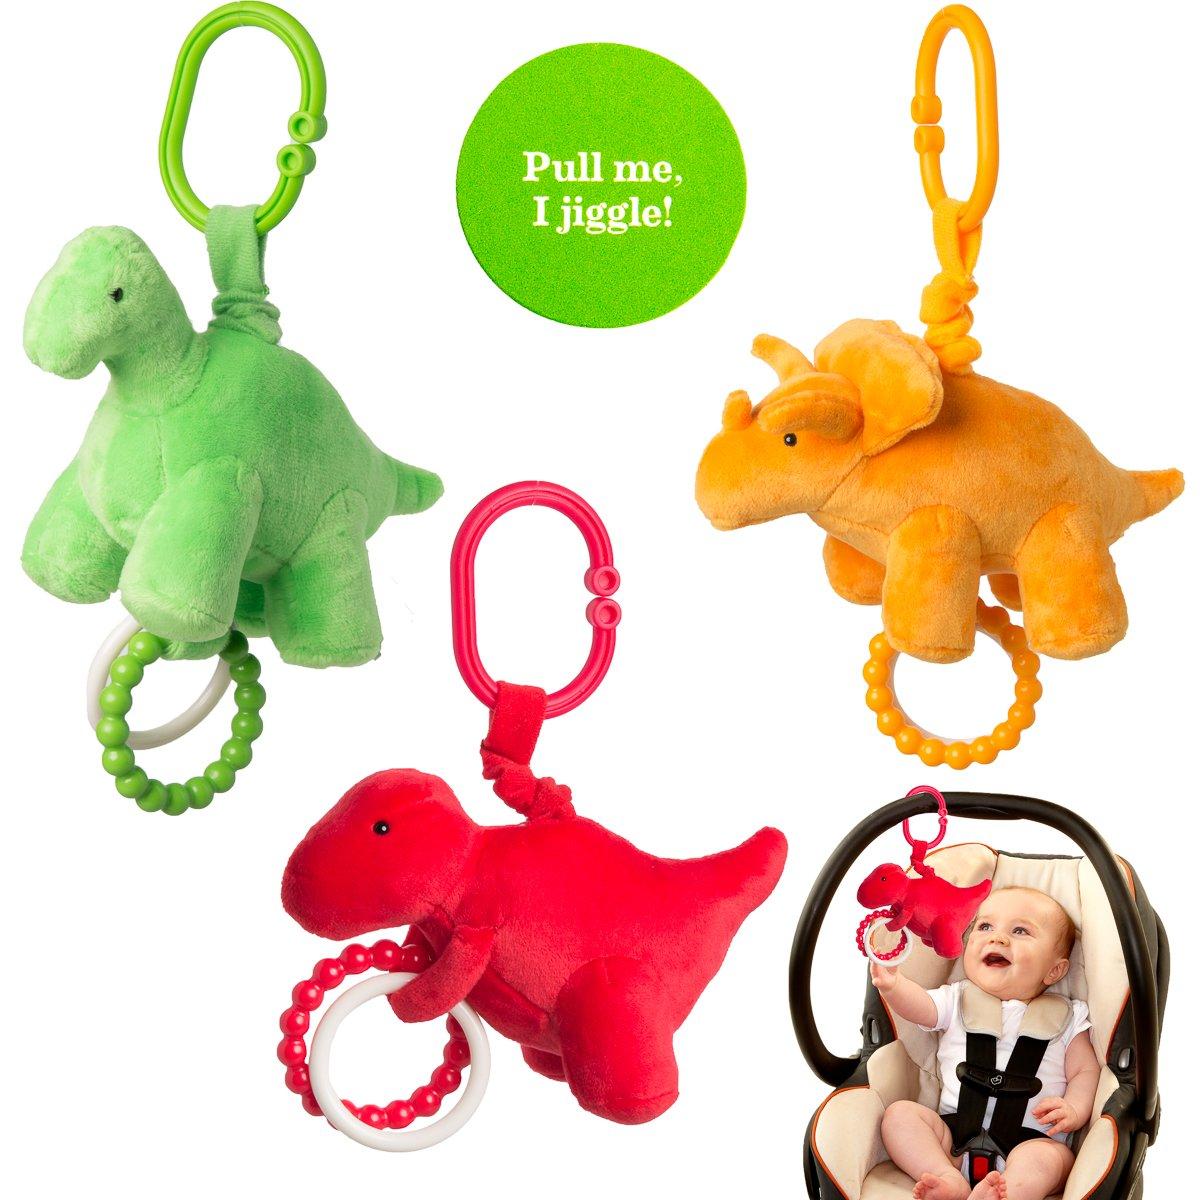 Manhattan Toy Company (Set of 3) Newborn Baby Toys Plush Jiggle Hanging Toys for Babies Teething